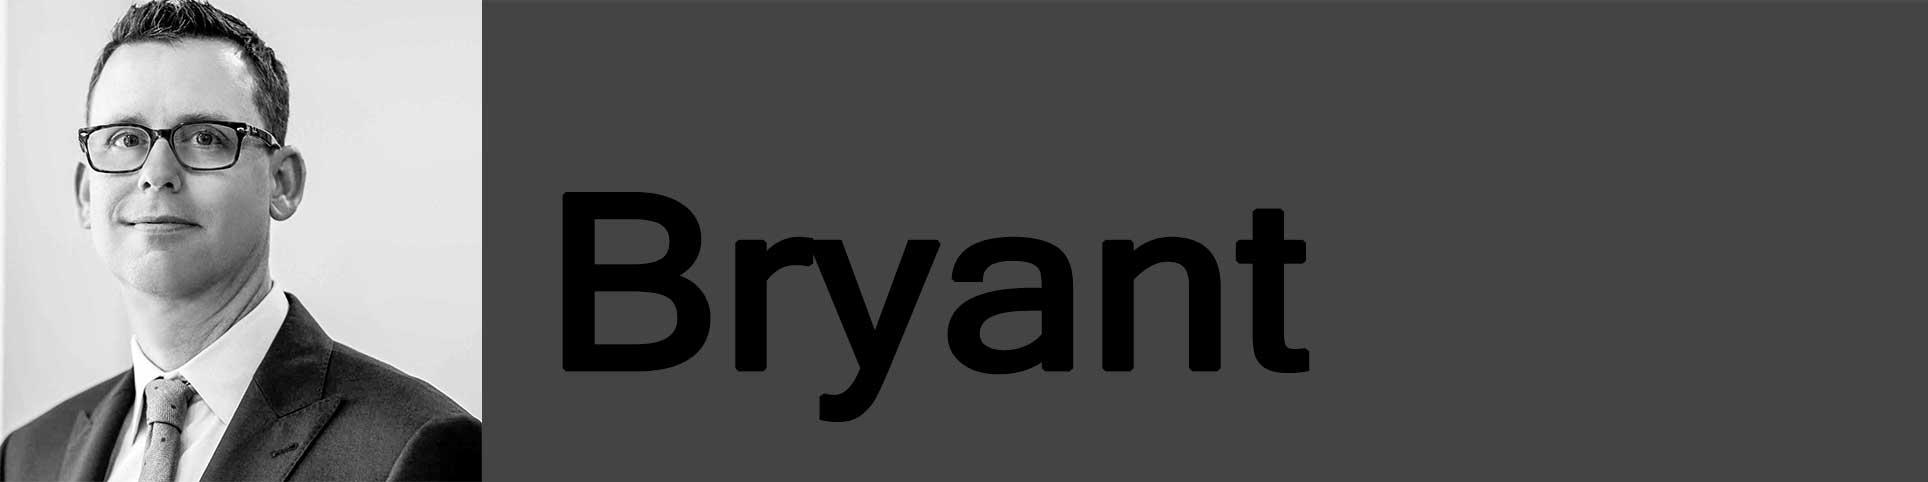 bryantHeader.jpg